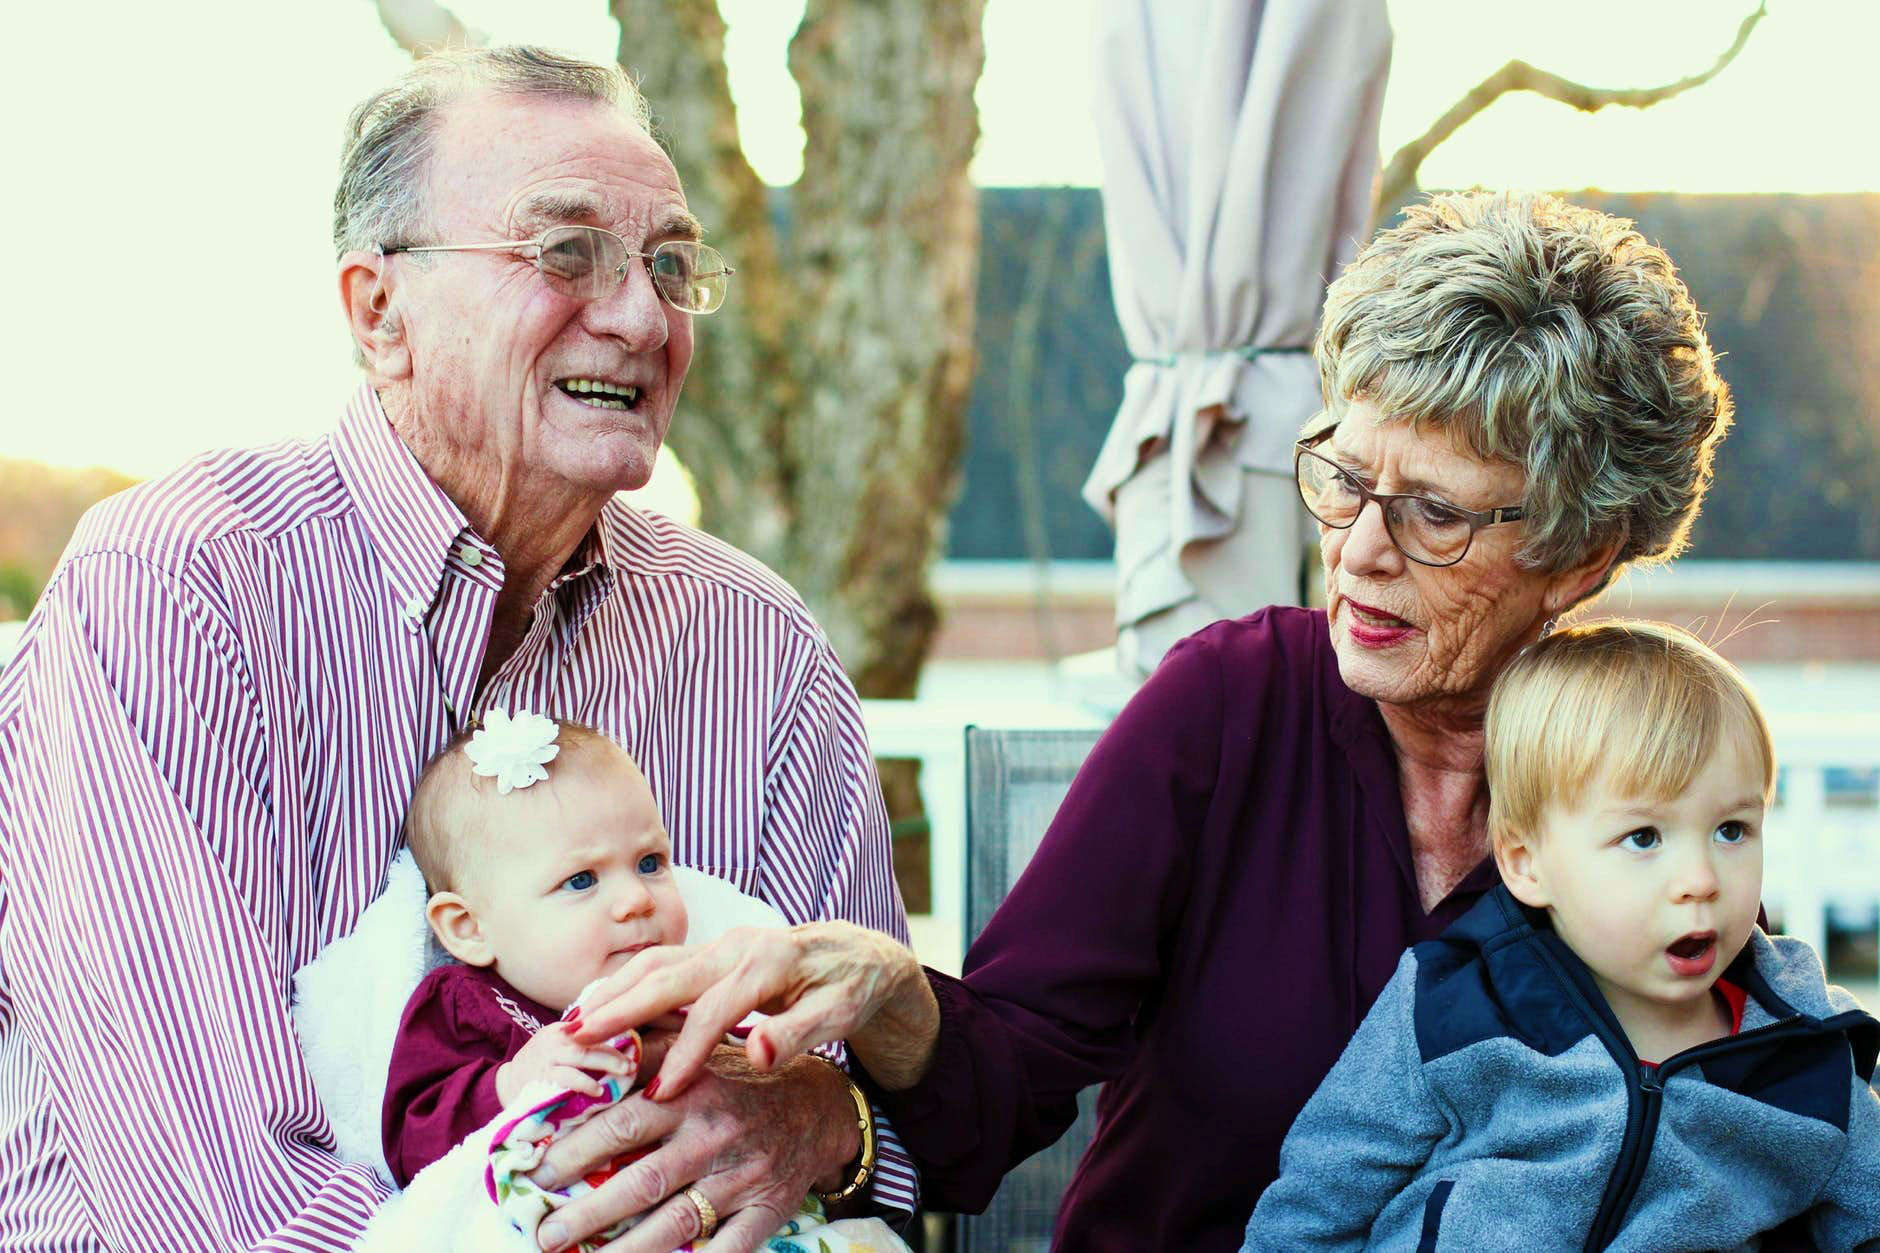 Grandpa and Grandma taking care of their grandchildren